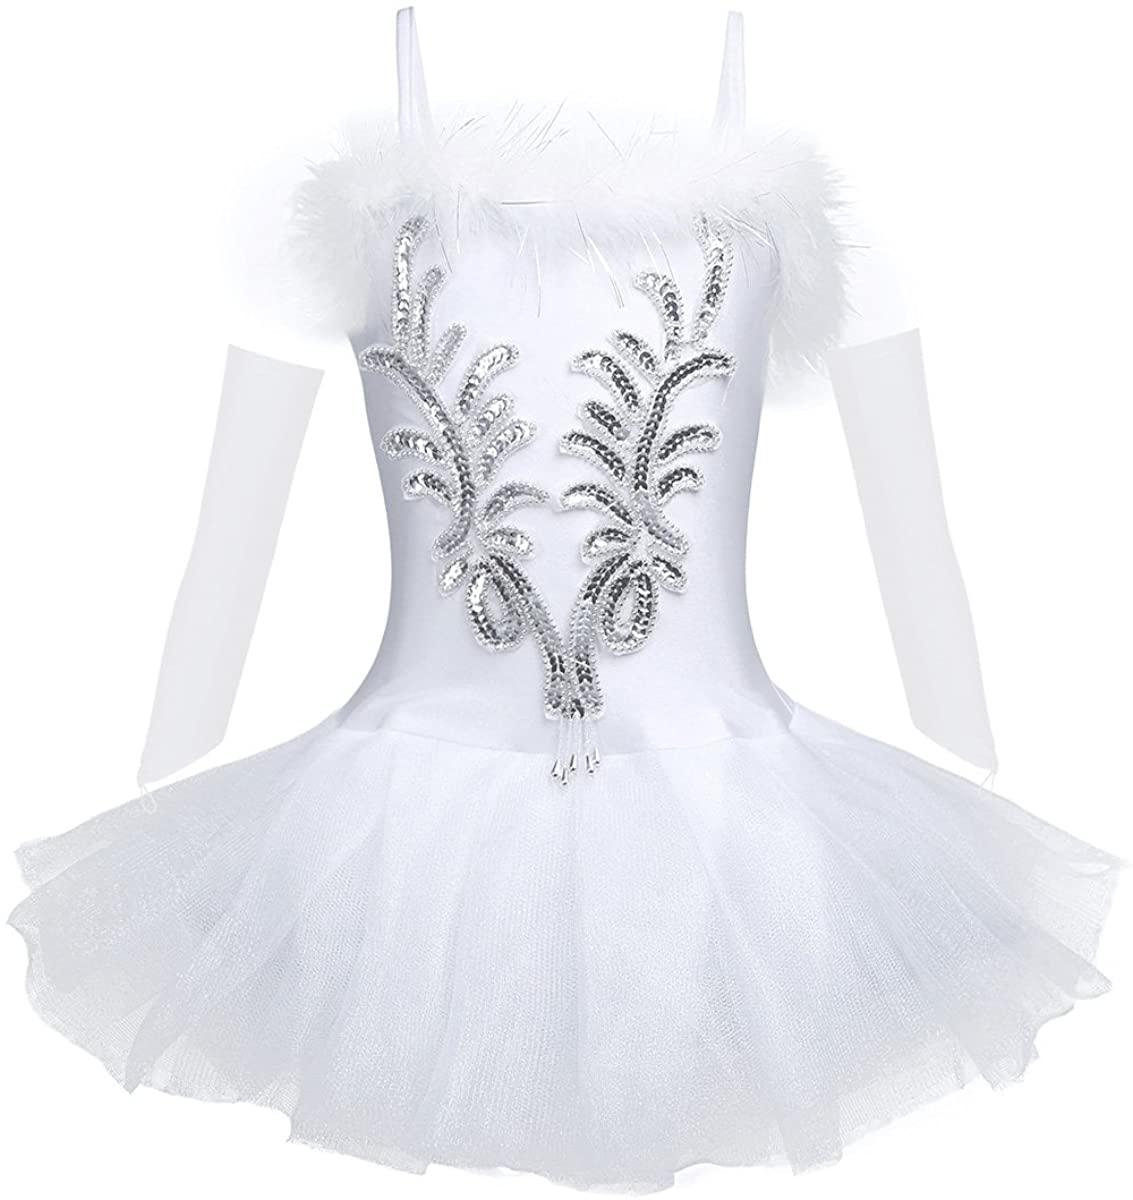 Kaerm Girls Kids Sequins Swan Lake Performance Costume Spaghetti Straps Tutu Dress with Gloves Hair Ballet Dancewear